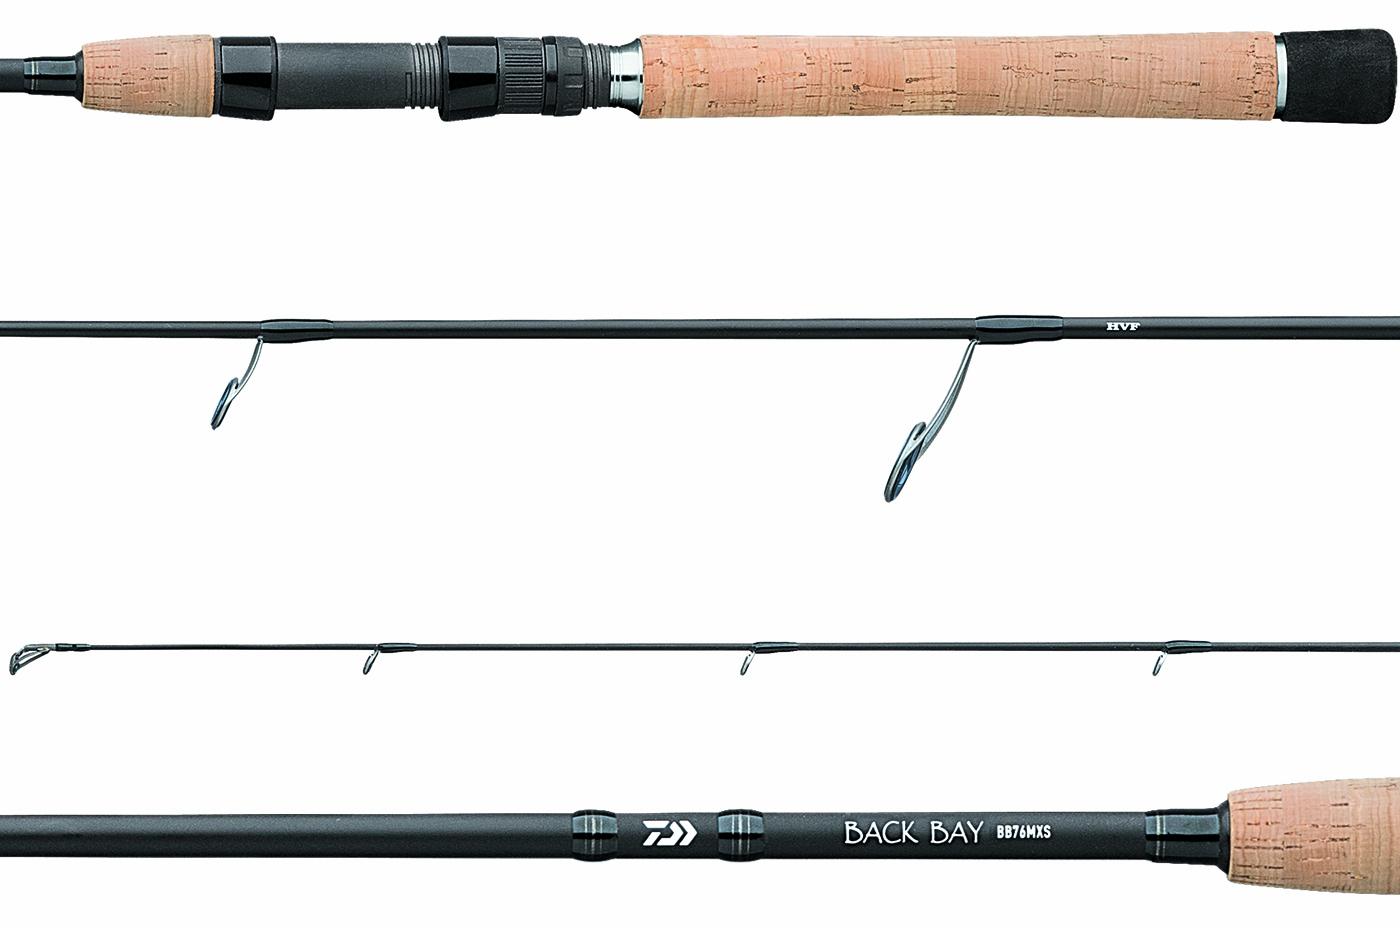 Daiwa Back Bay Spinning Rods - TackleDirect